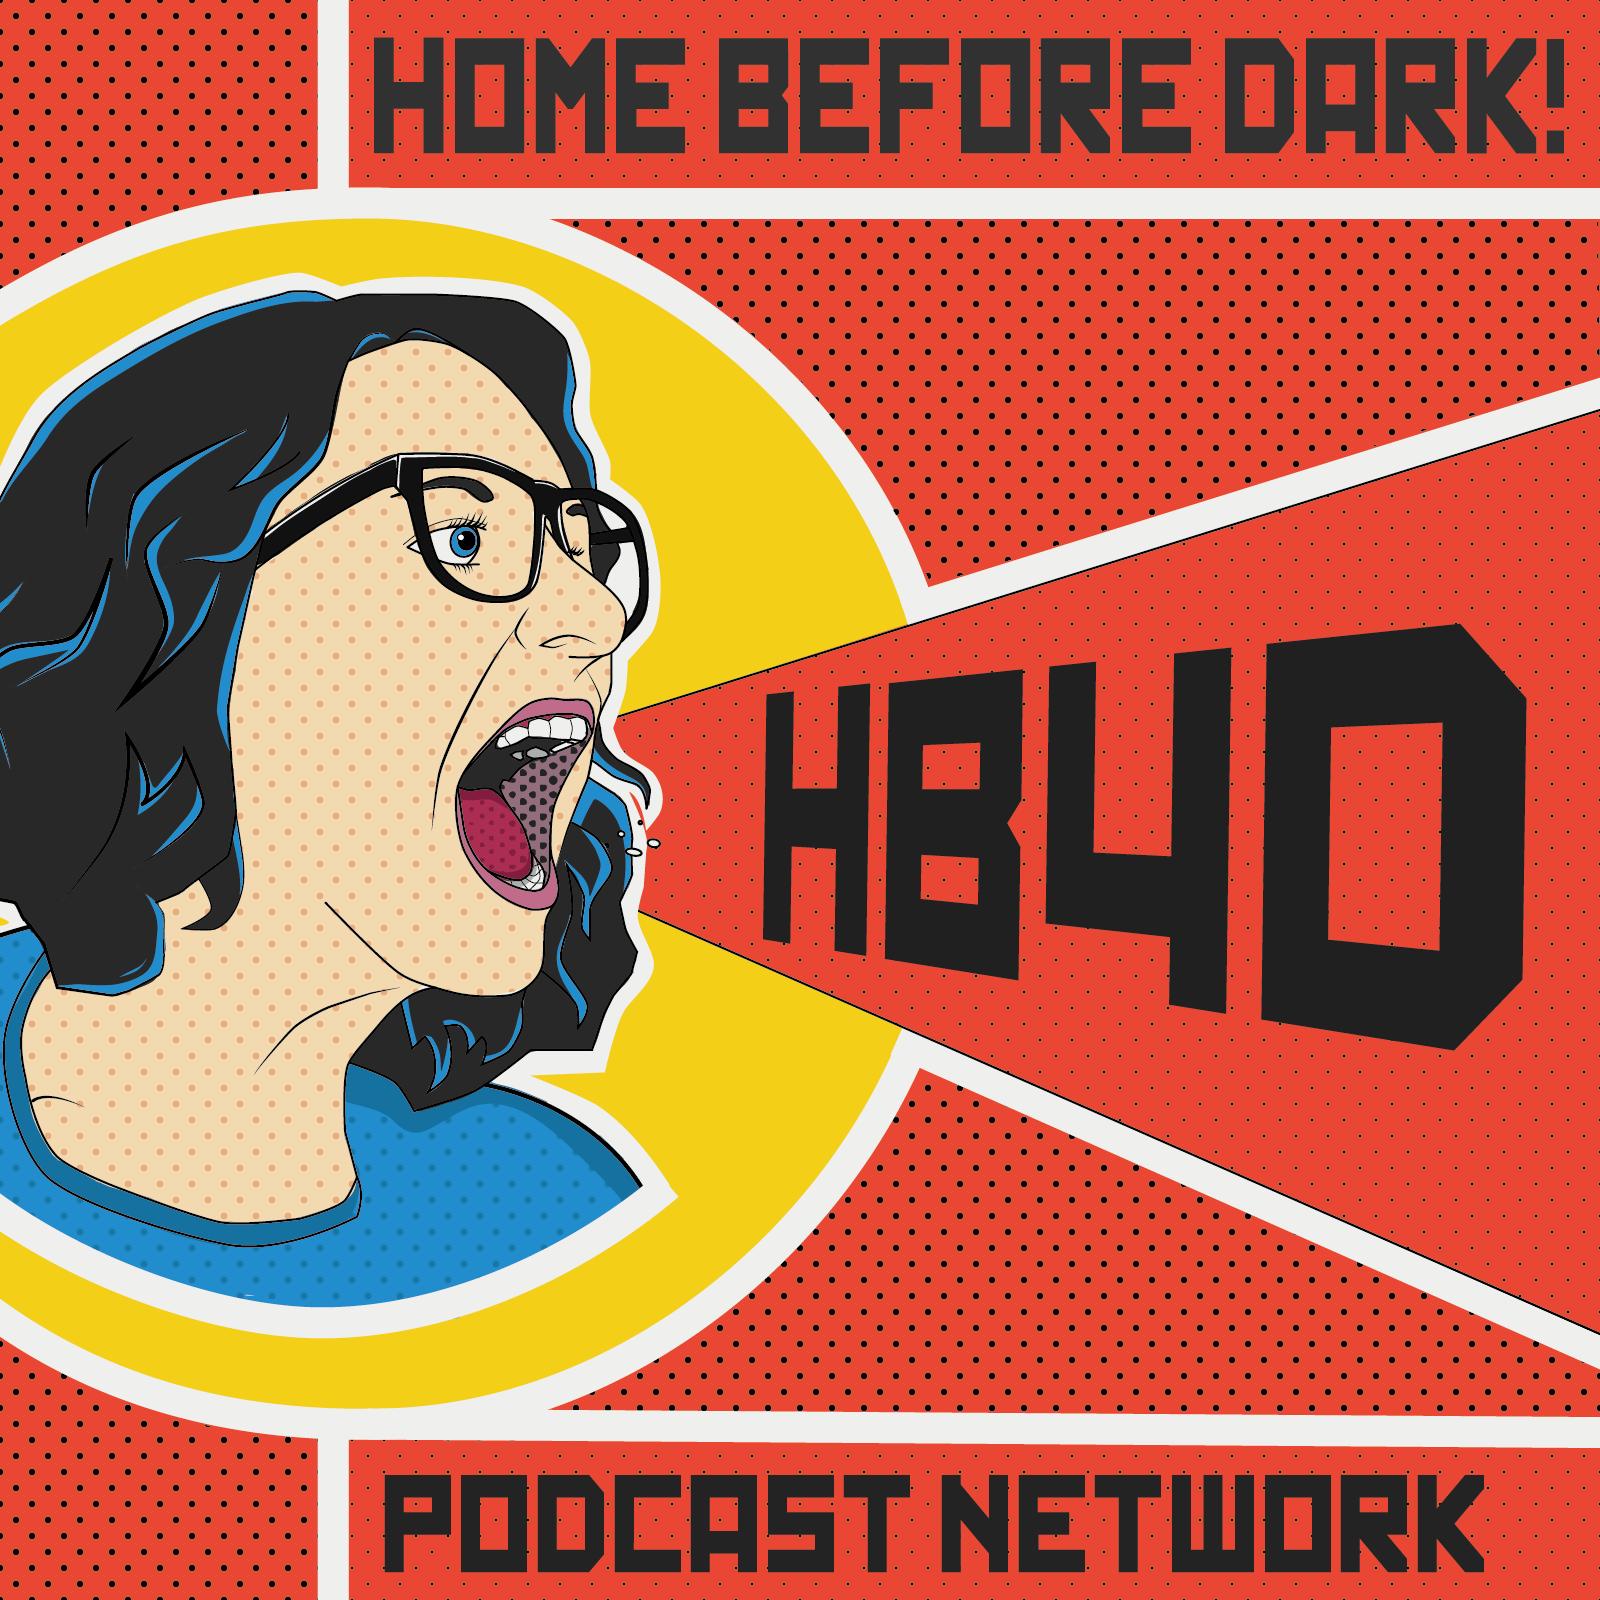 Home Before Dark Podcast Network